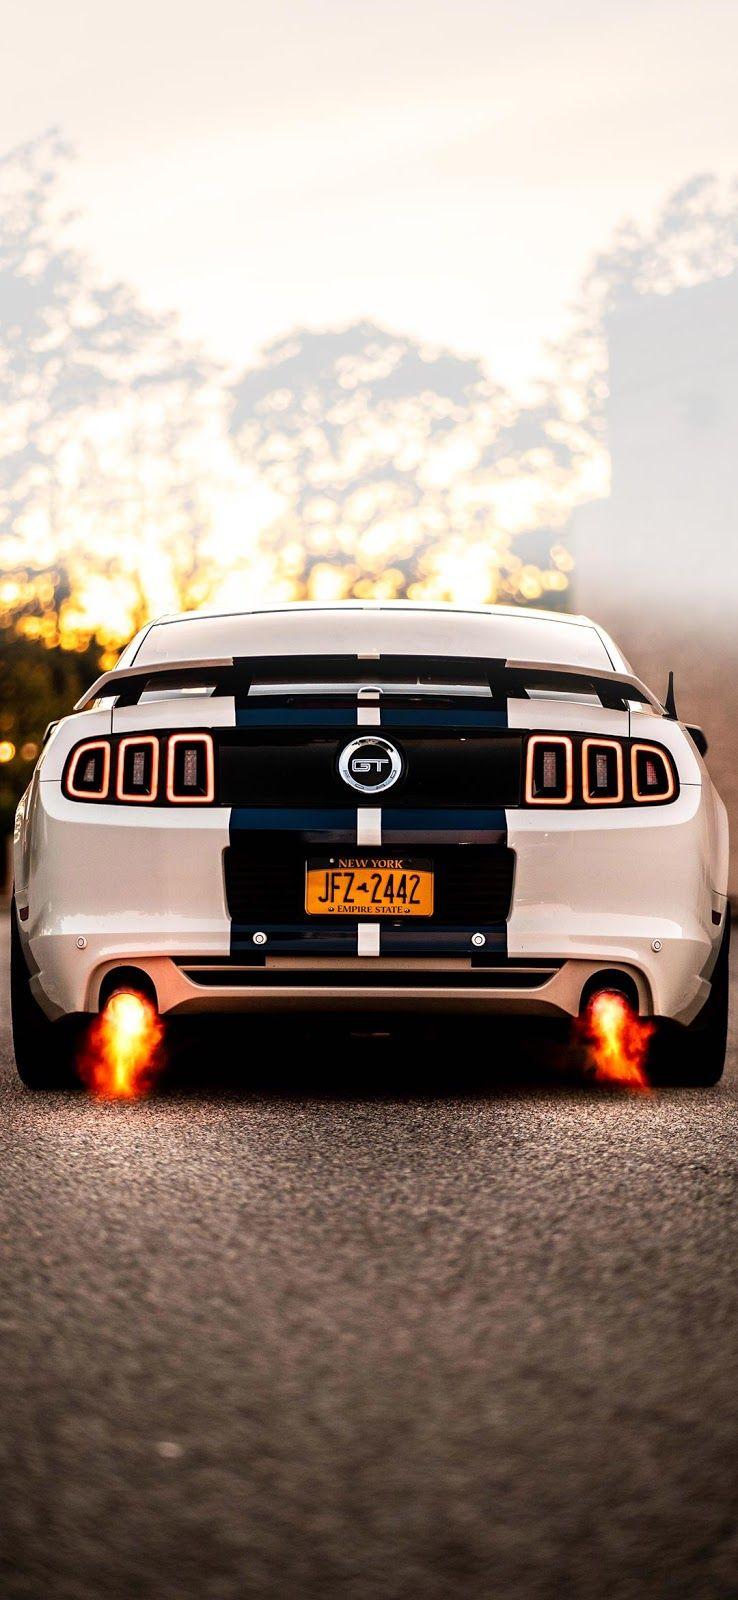 Mustang Gt Wallpaper Mustang Gt 2014 Ford Mustang Mustang